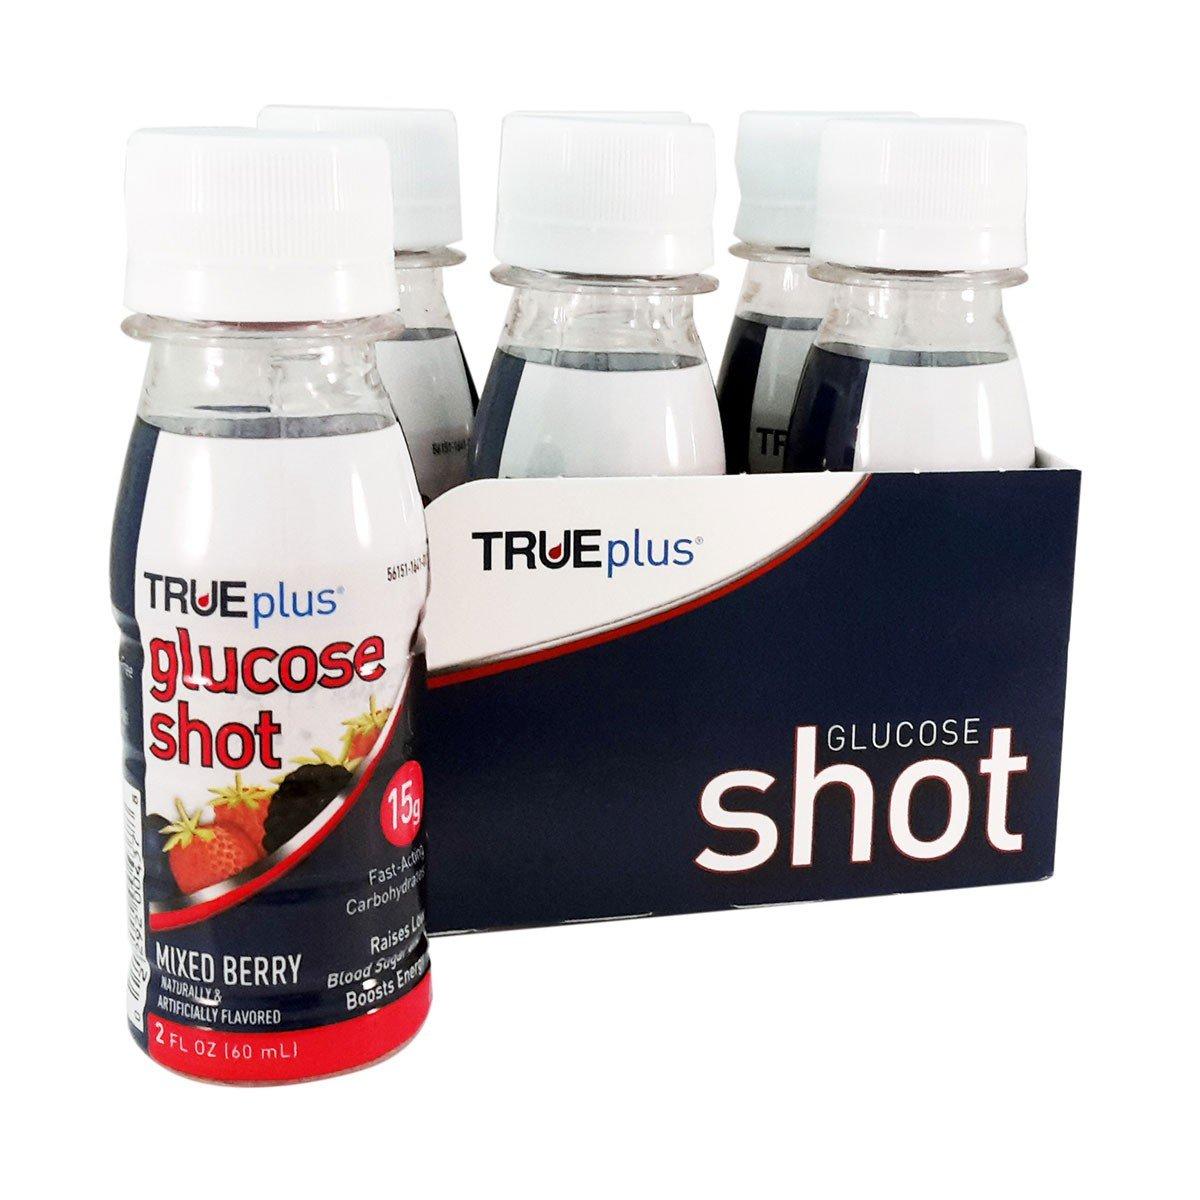 TRUEplus Glucose Shot 6-pack - Mixed Berry